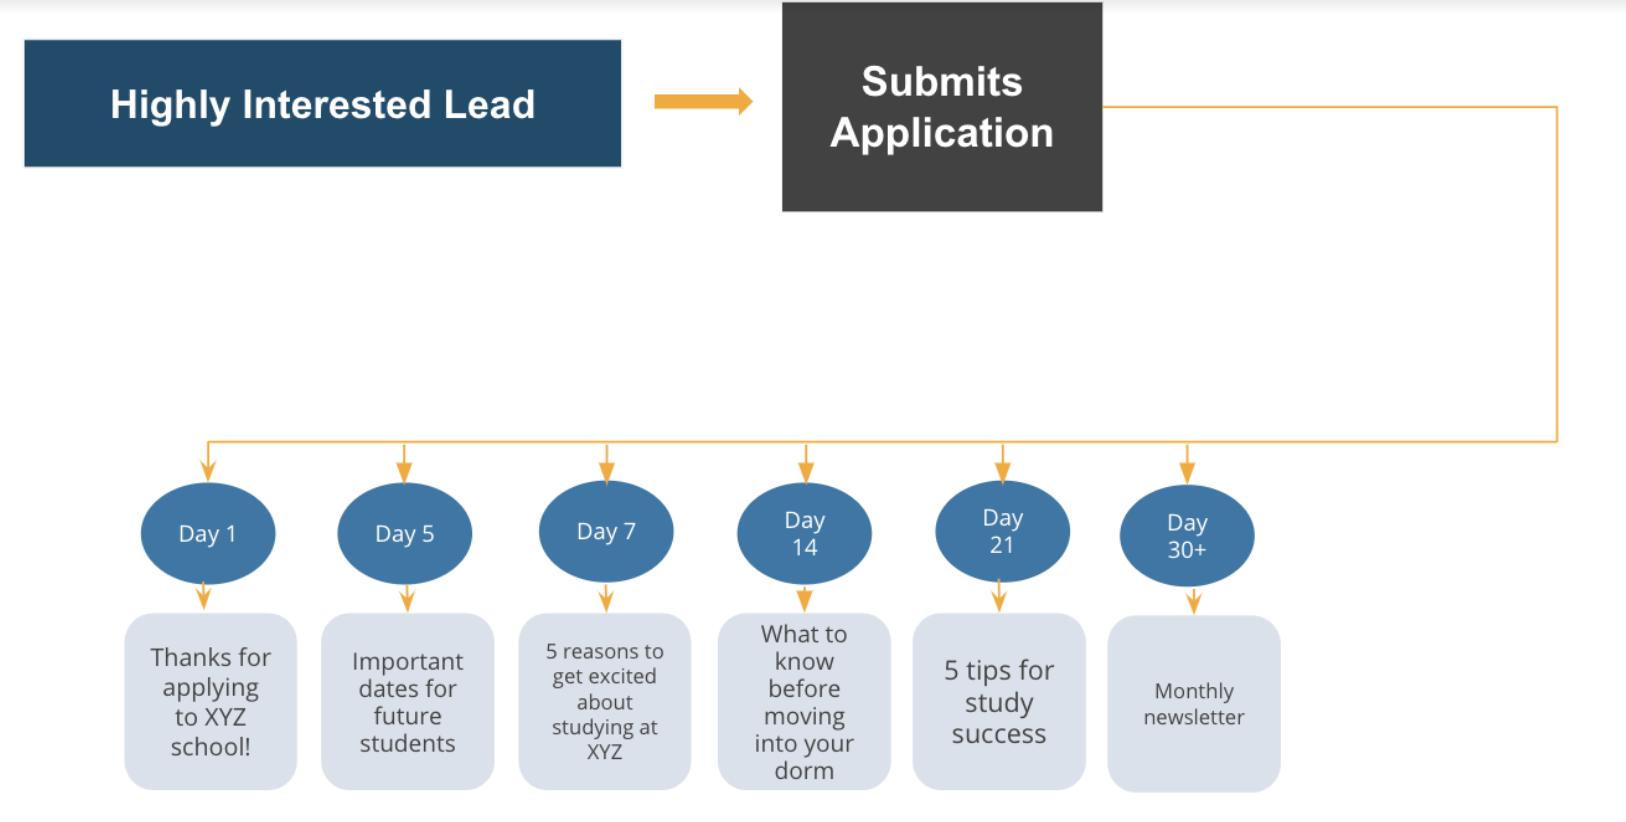 student application portal workflow